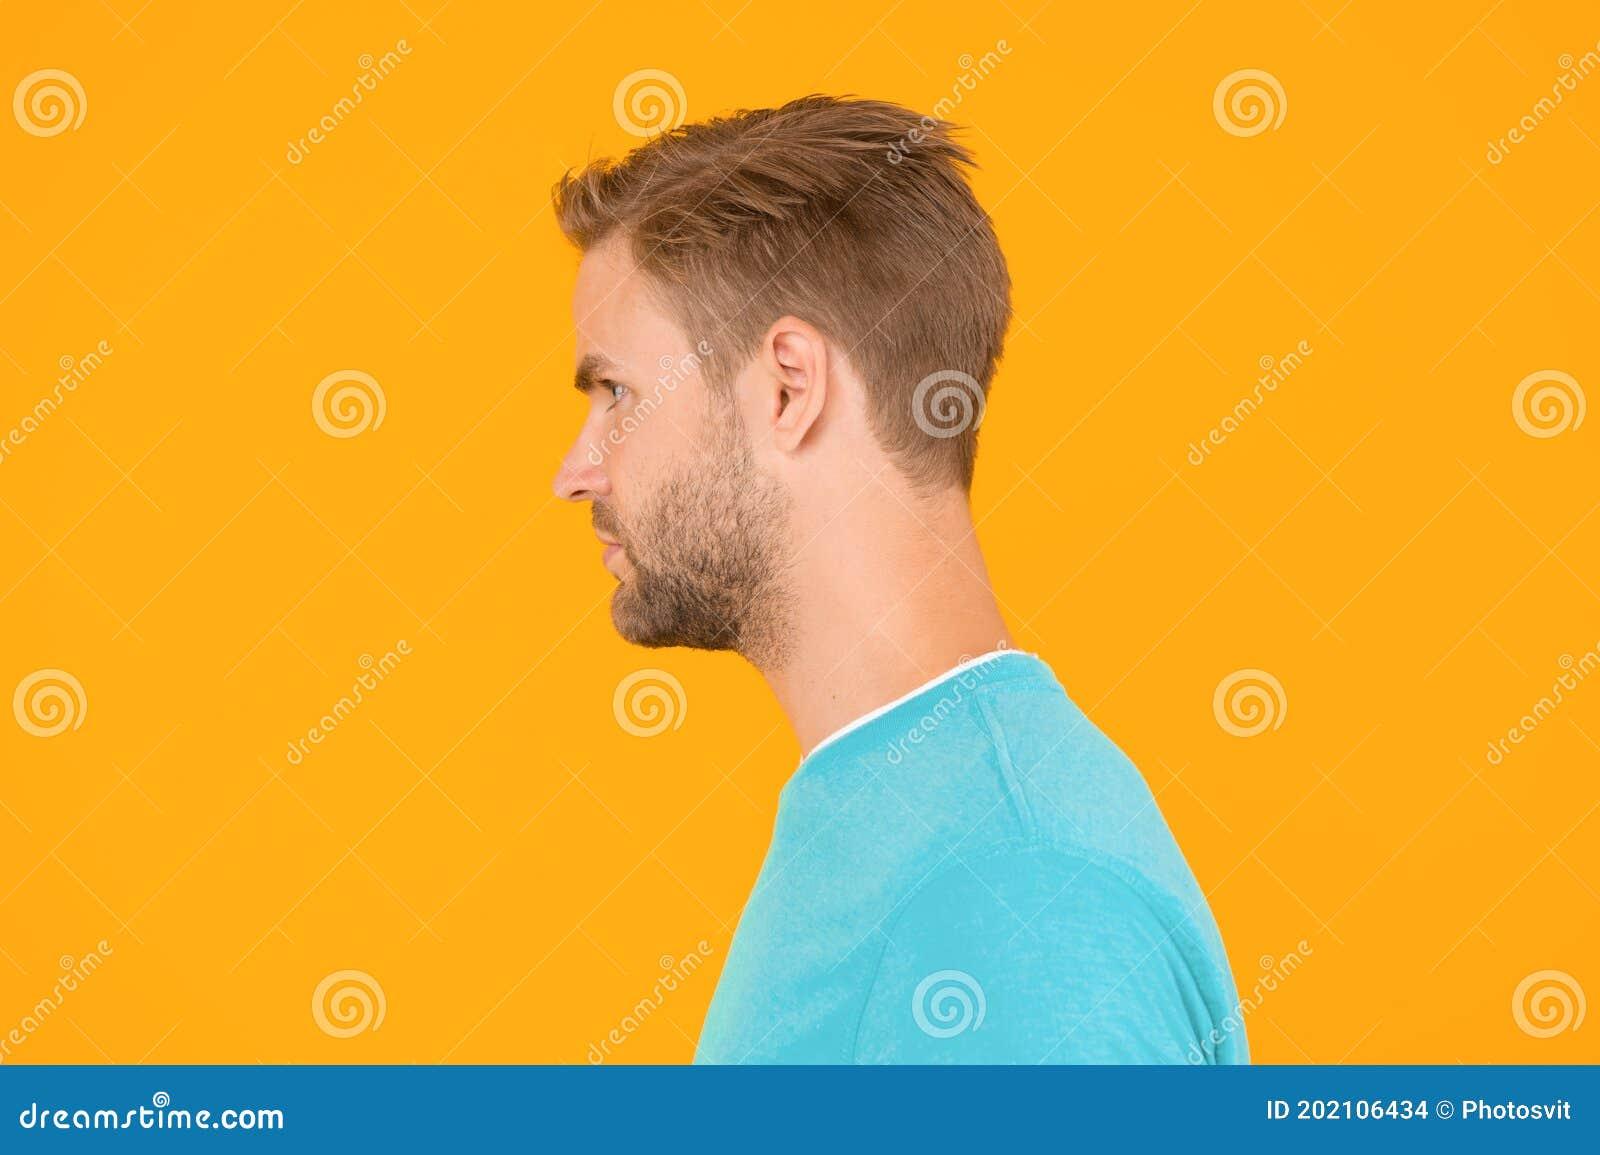 Guy profile sexy 20 Irresistible